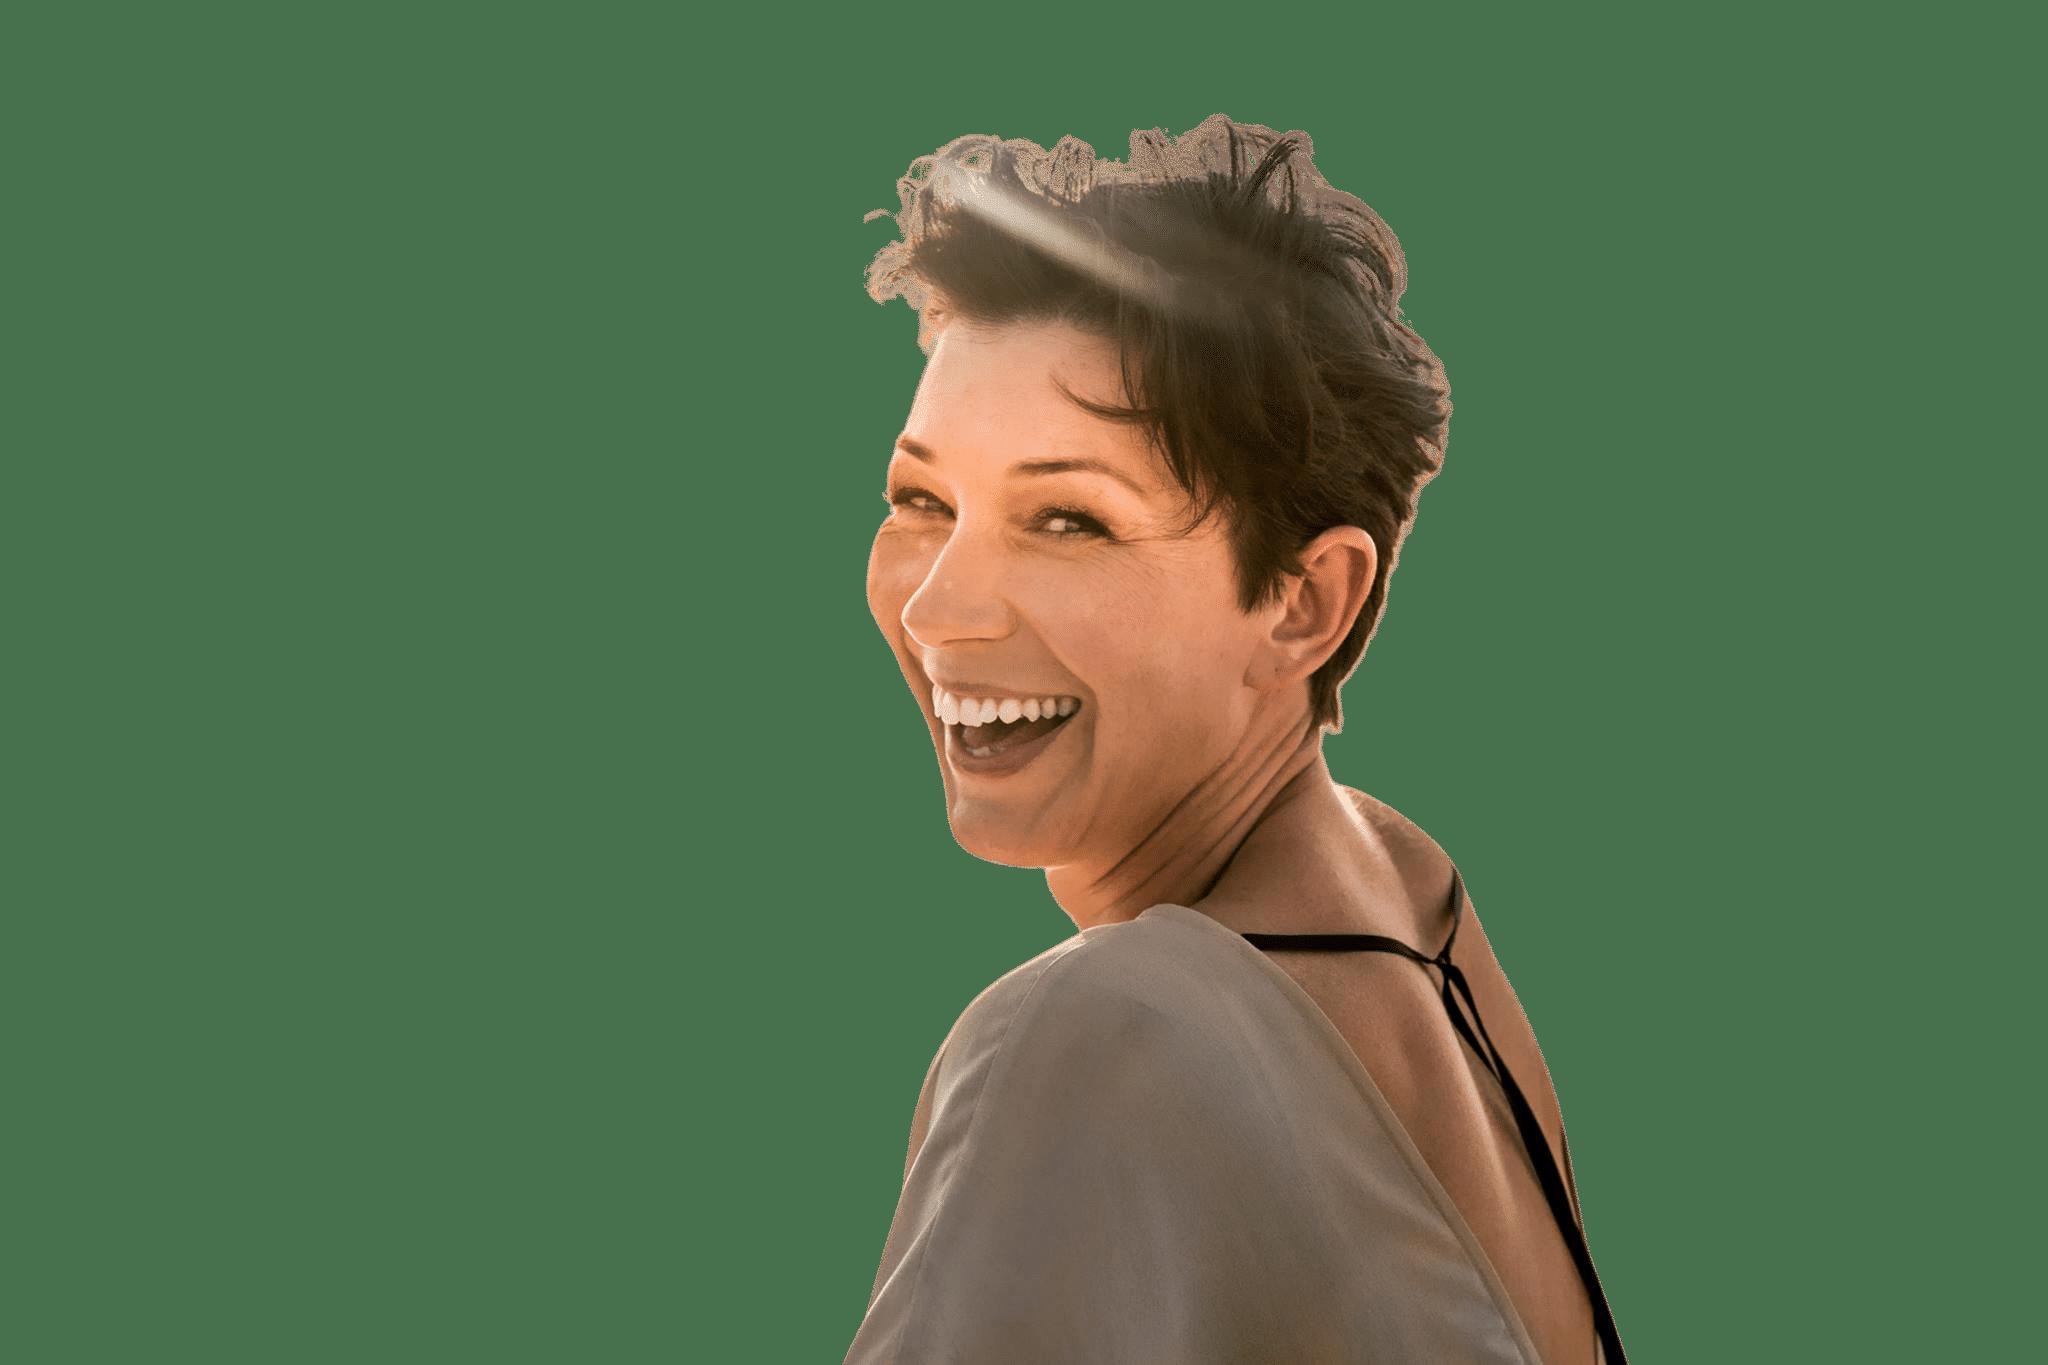 Elke Friedrichs Systemischer Coach Life Business Mentor